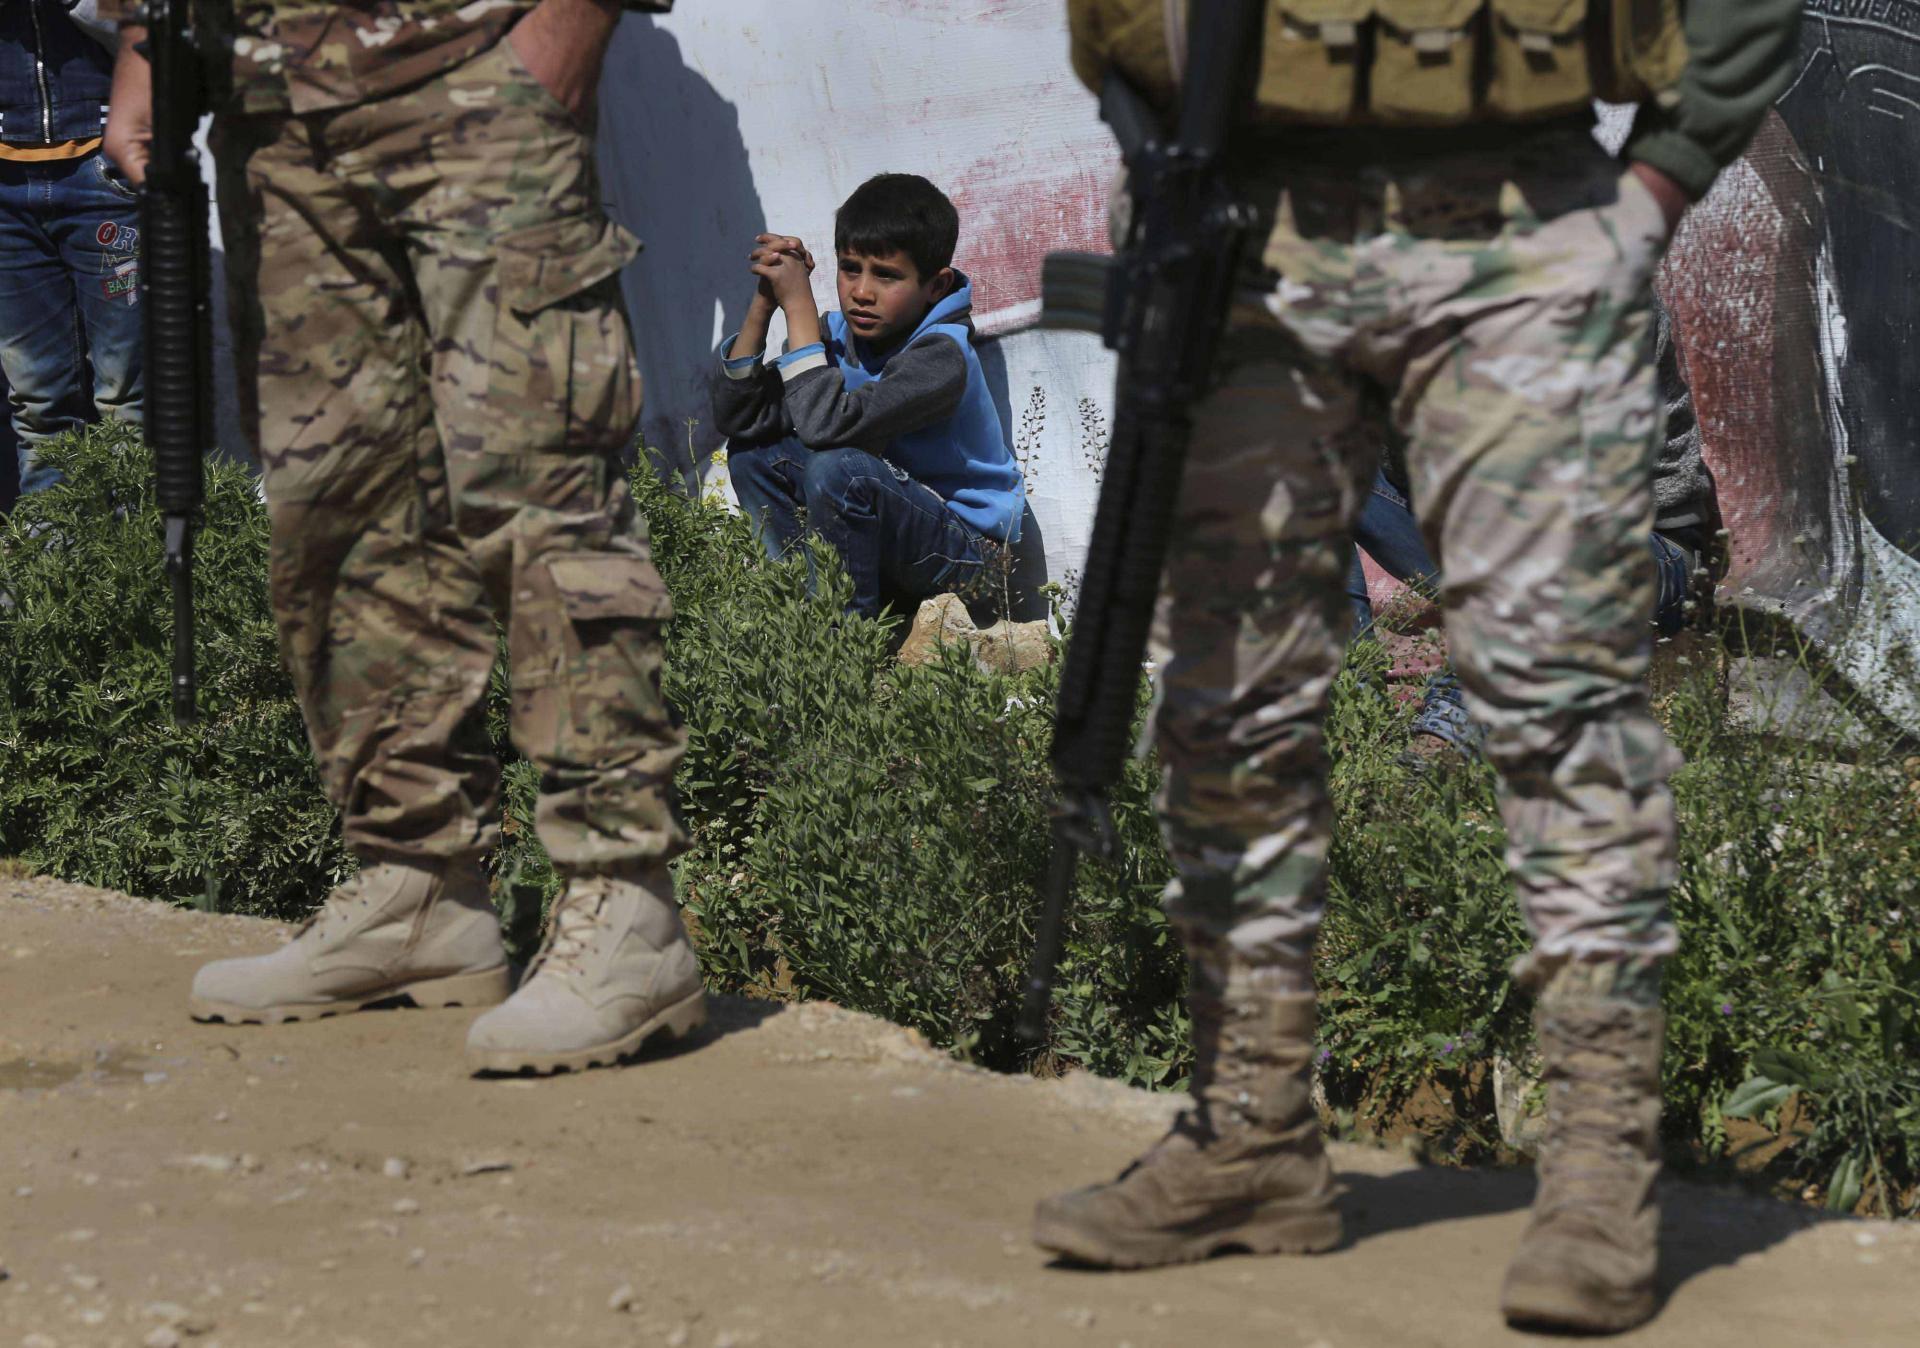 Lebanese Authorities Must Immediately Halt Deportation of Syrian Refugees